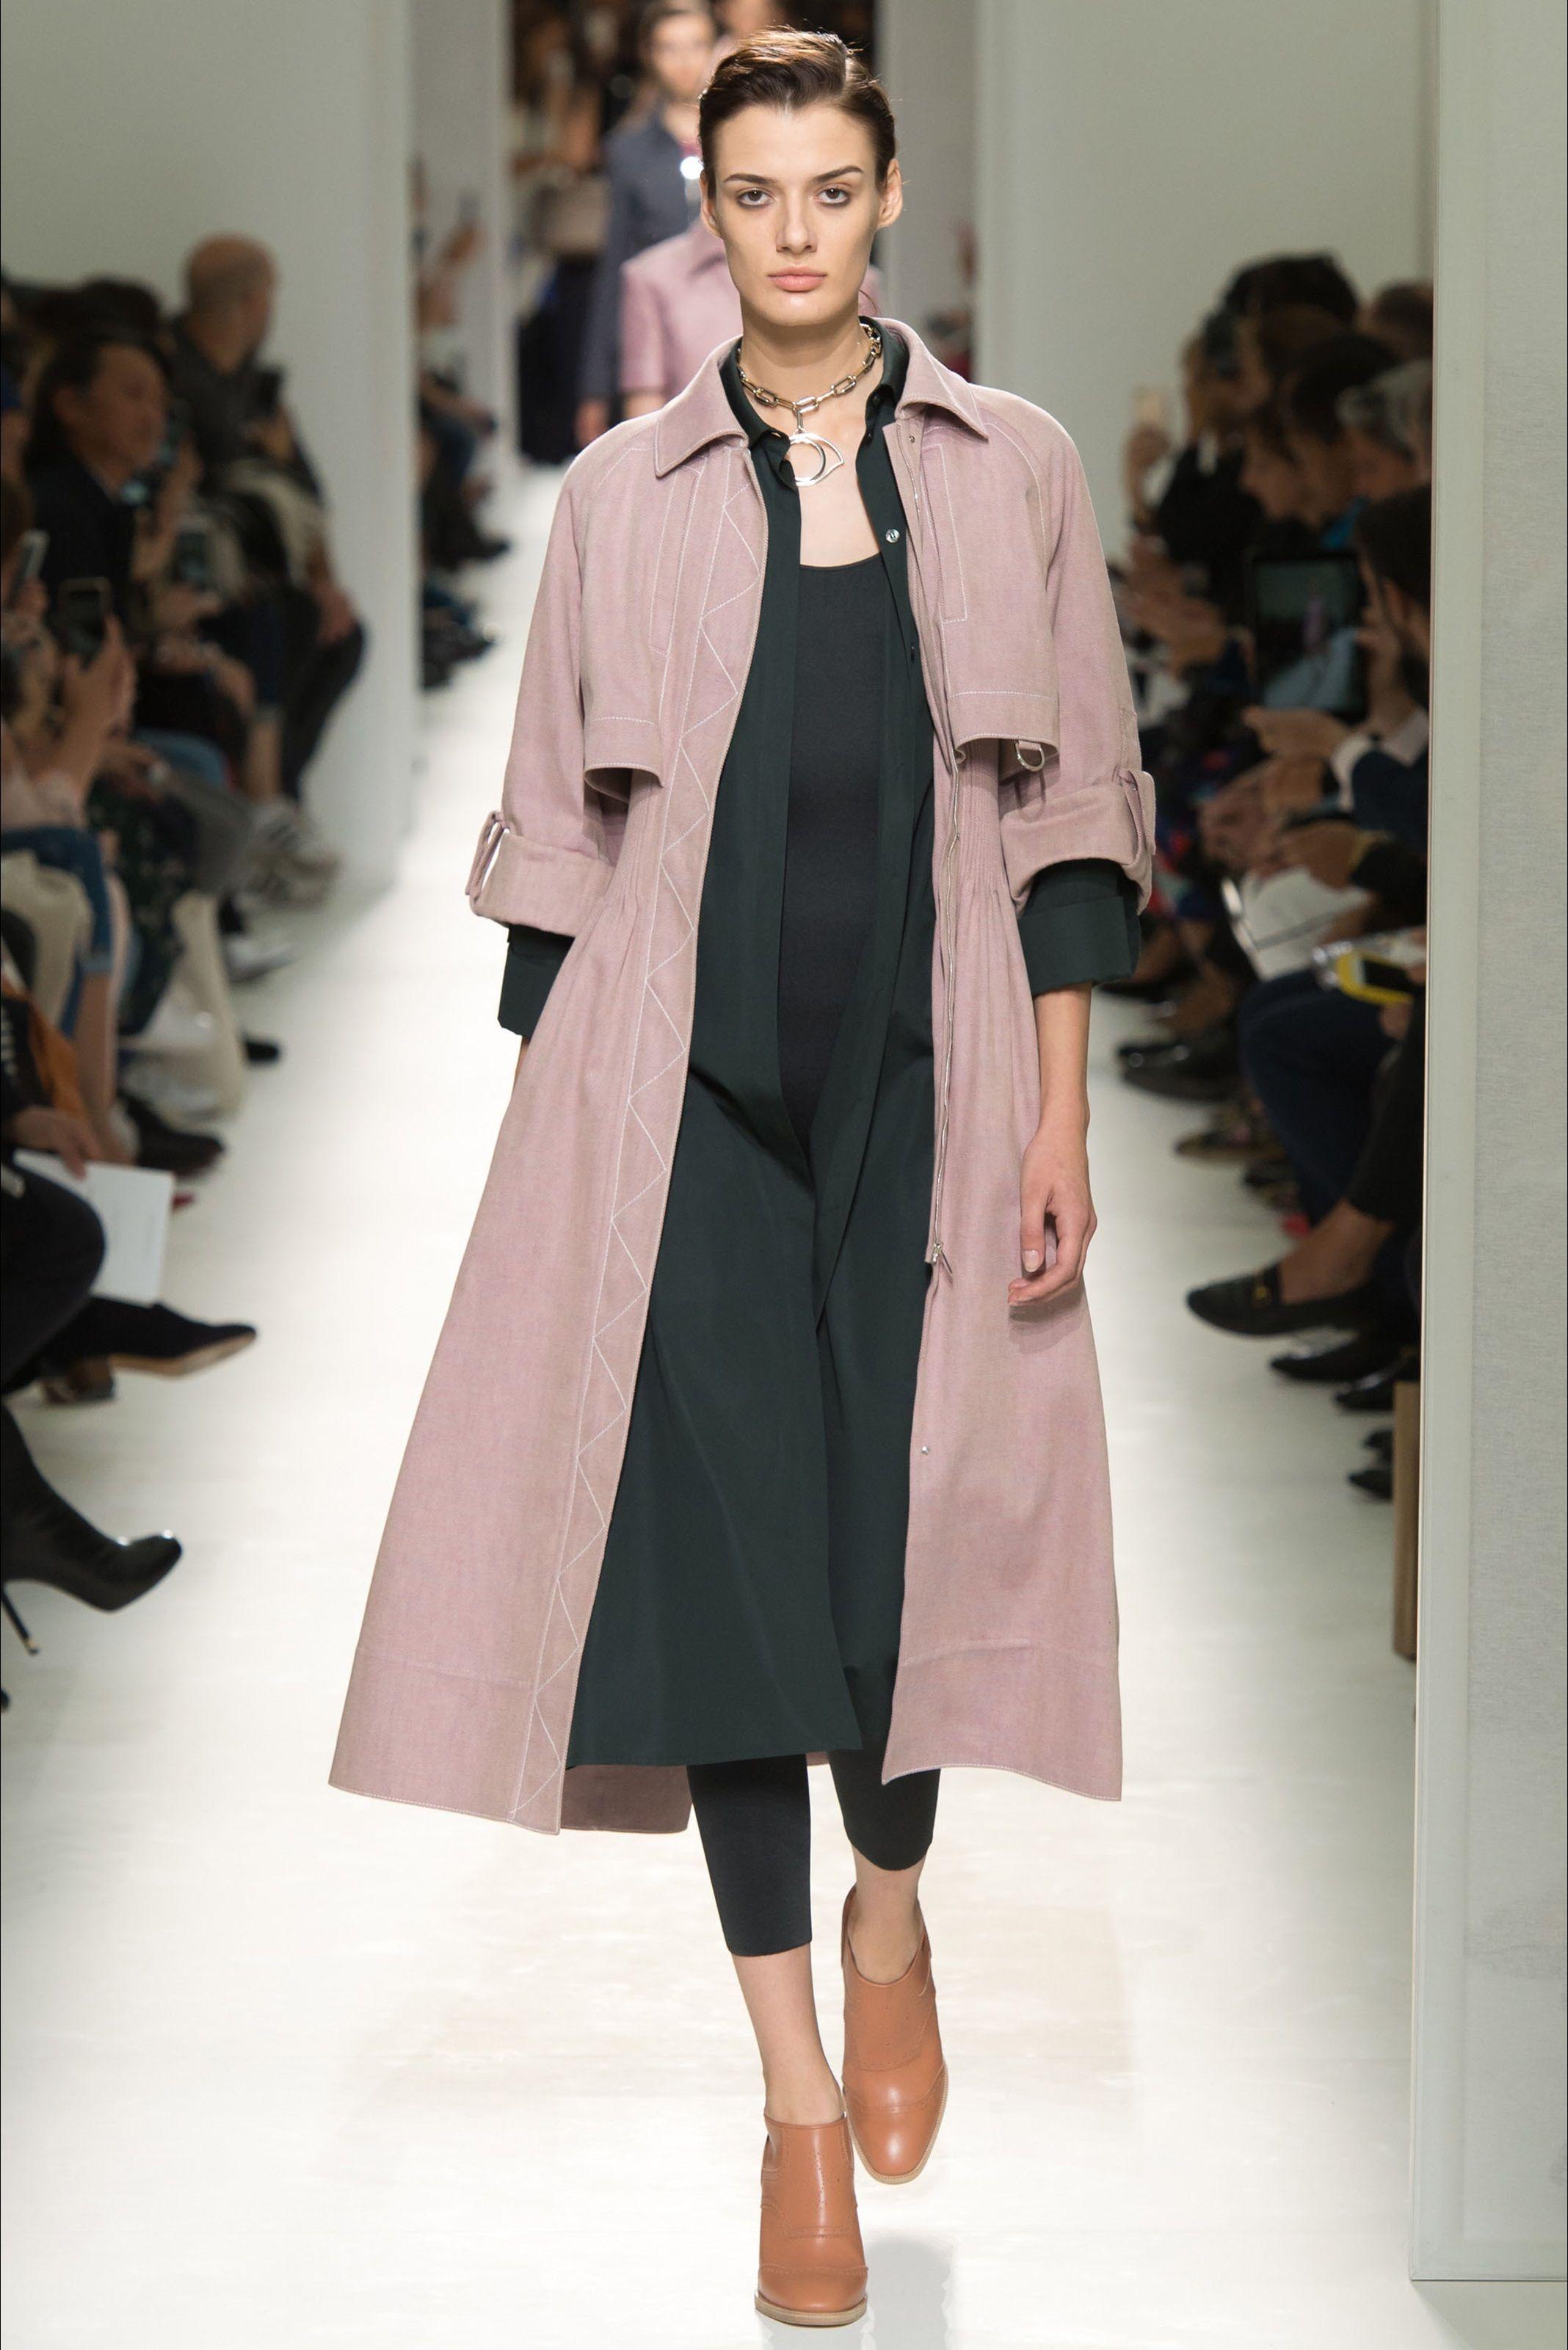 7ff8cf94dd3 Sfilata Hermès Parigi - Collezioni Primavera Estate 2017 - Vogue ...